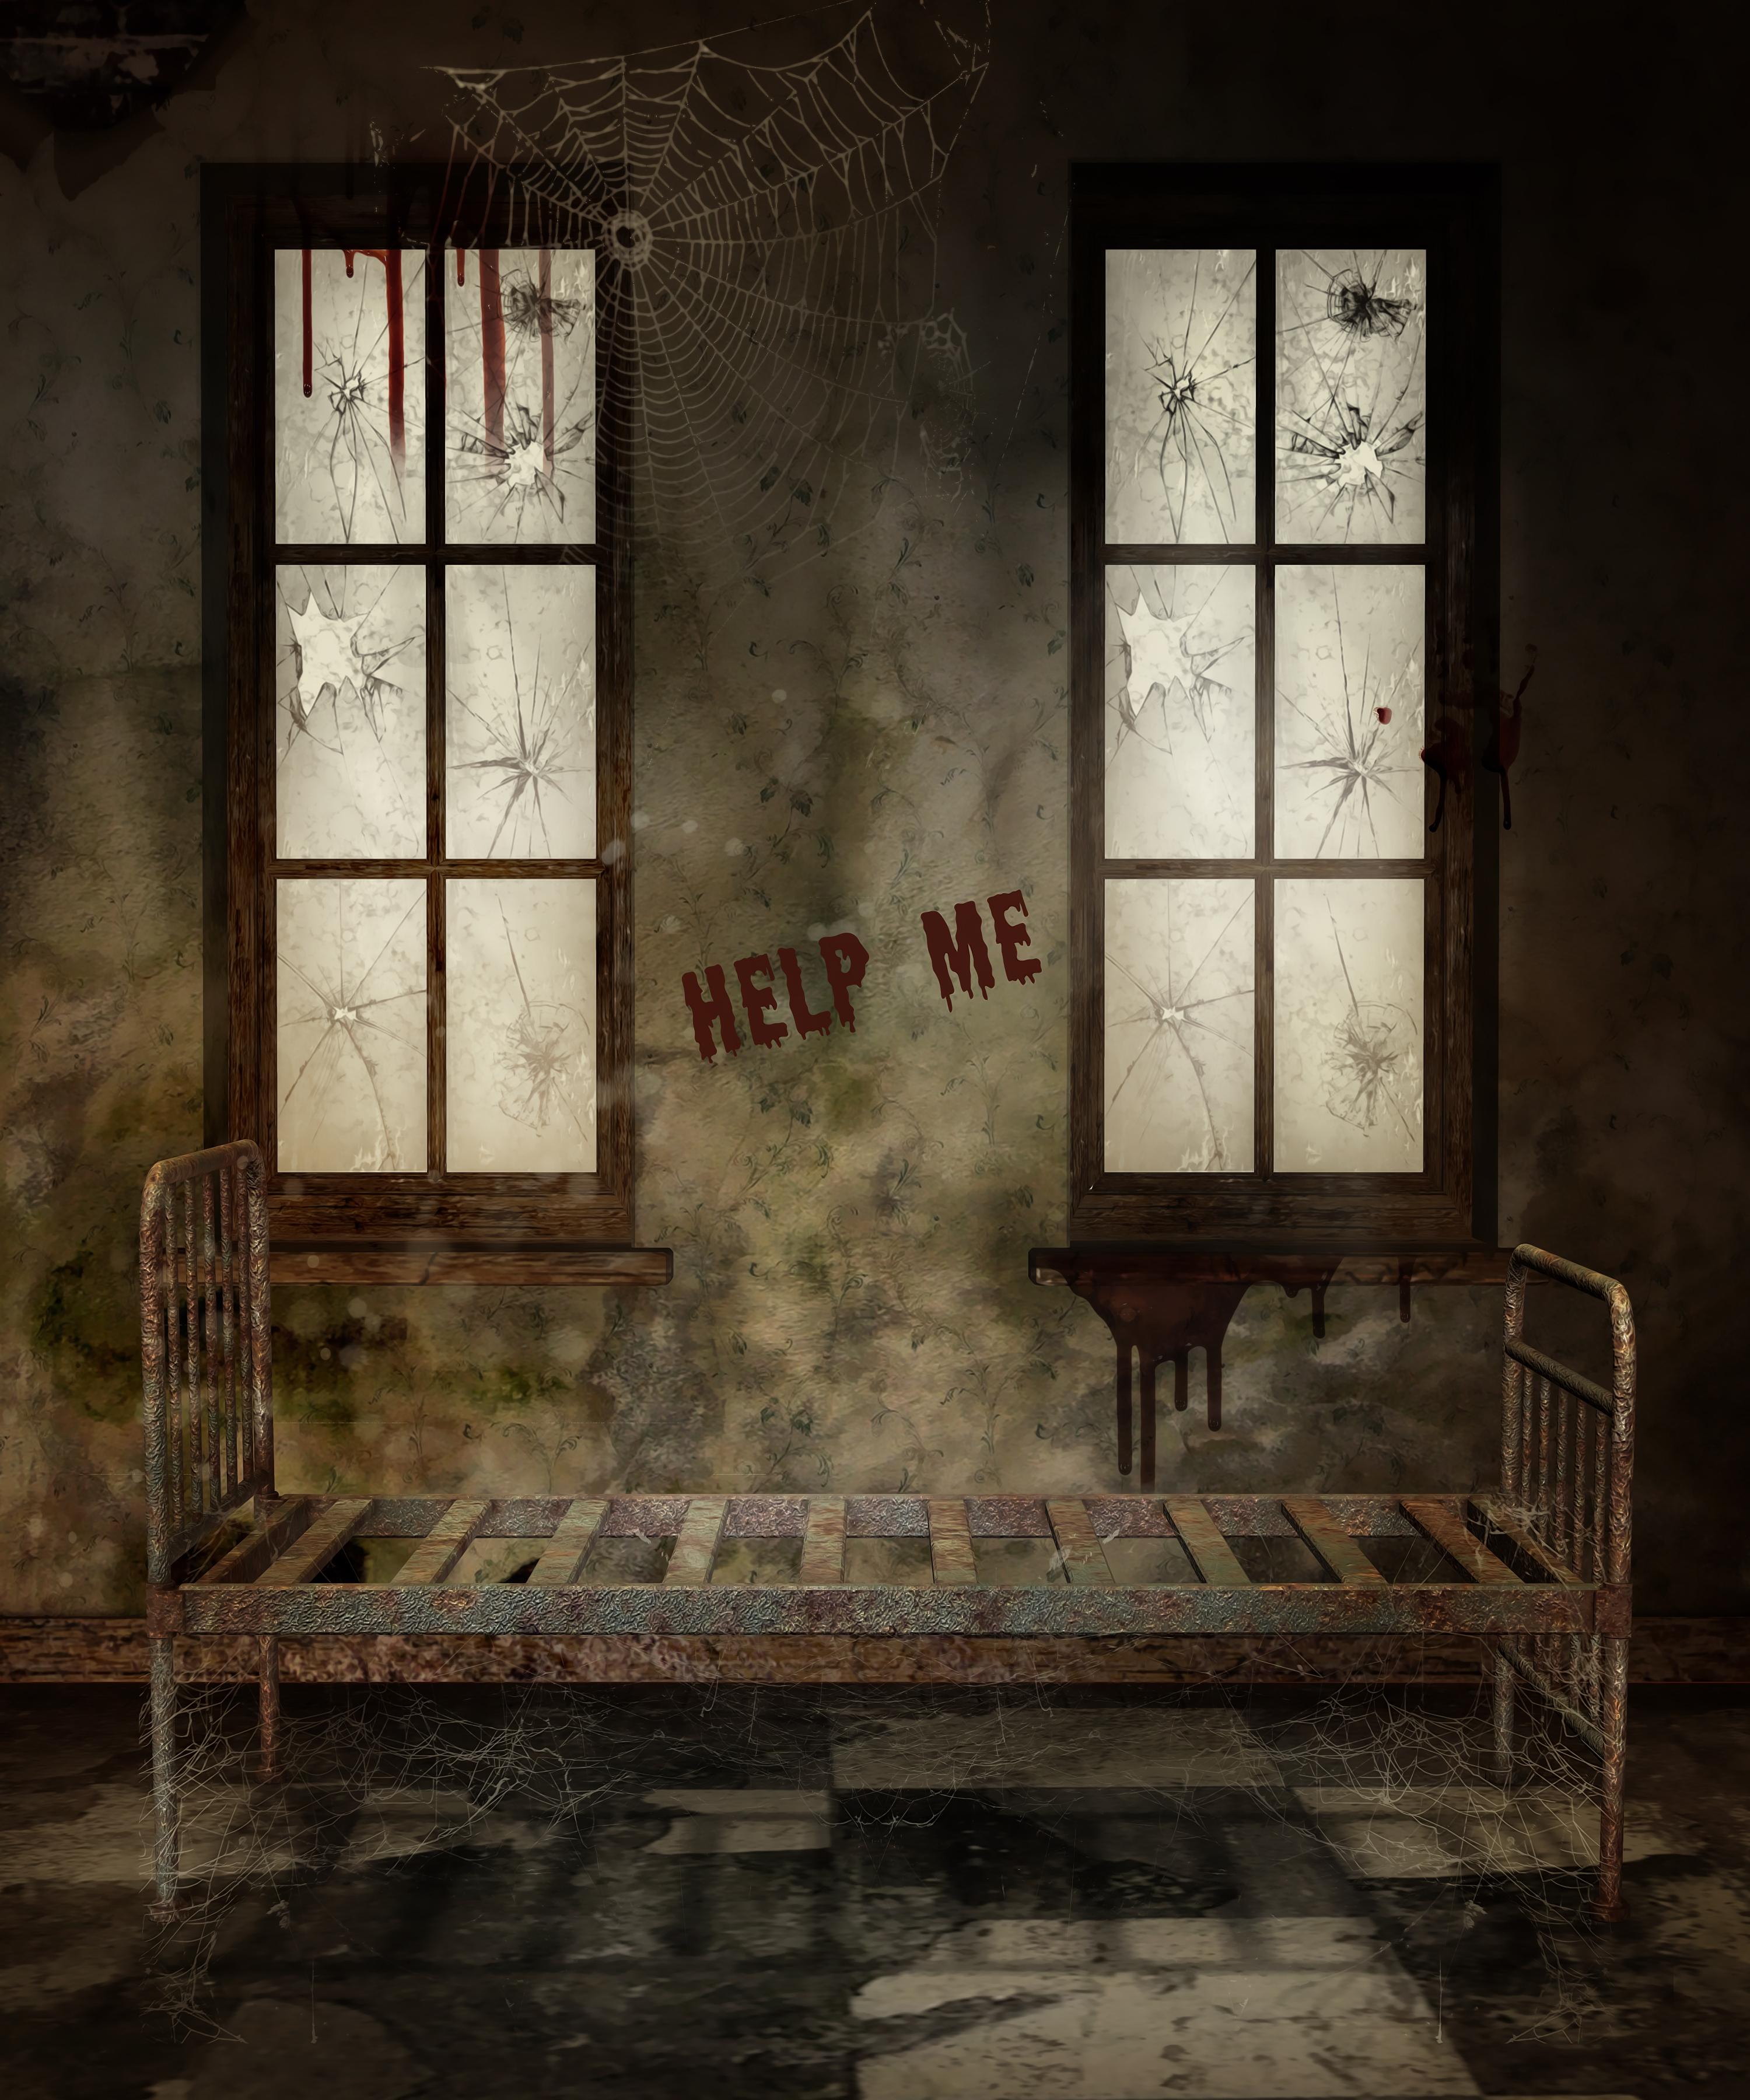 Asylum Escape Room Game - Mental Illness as Entertainment